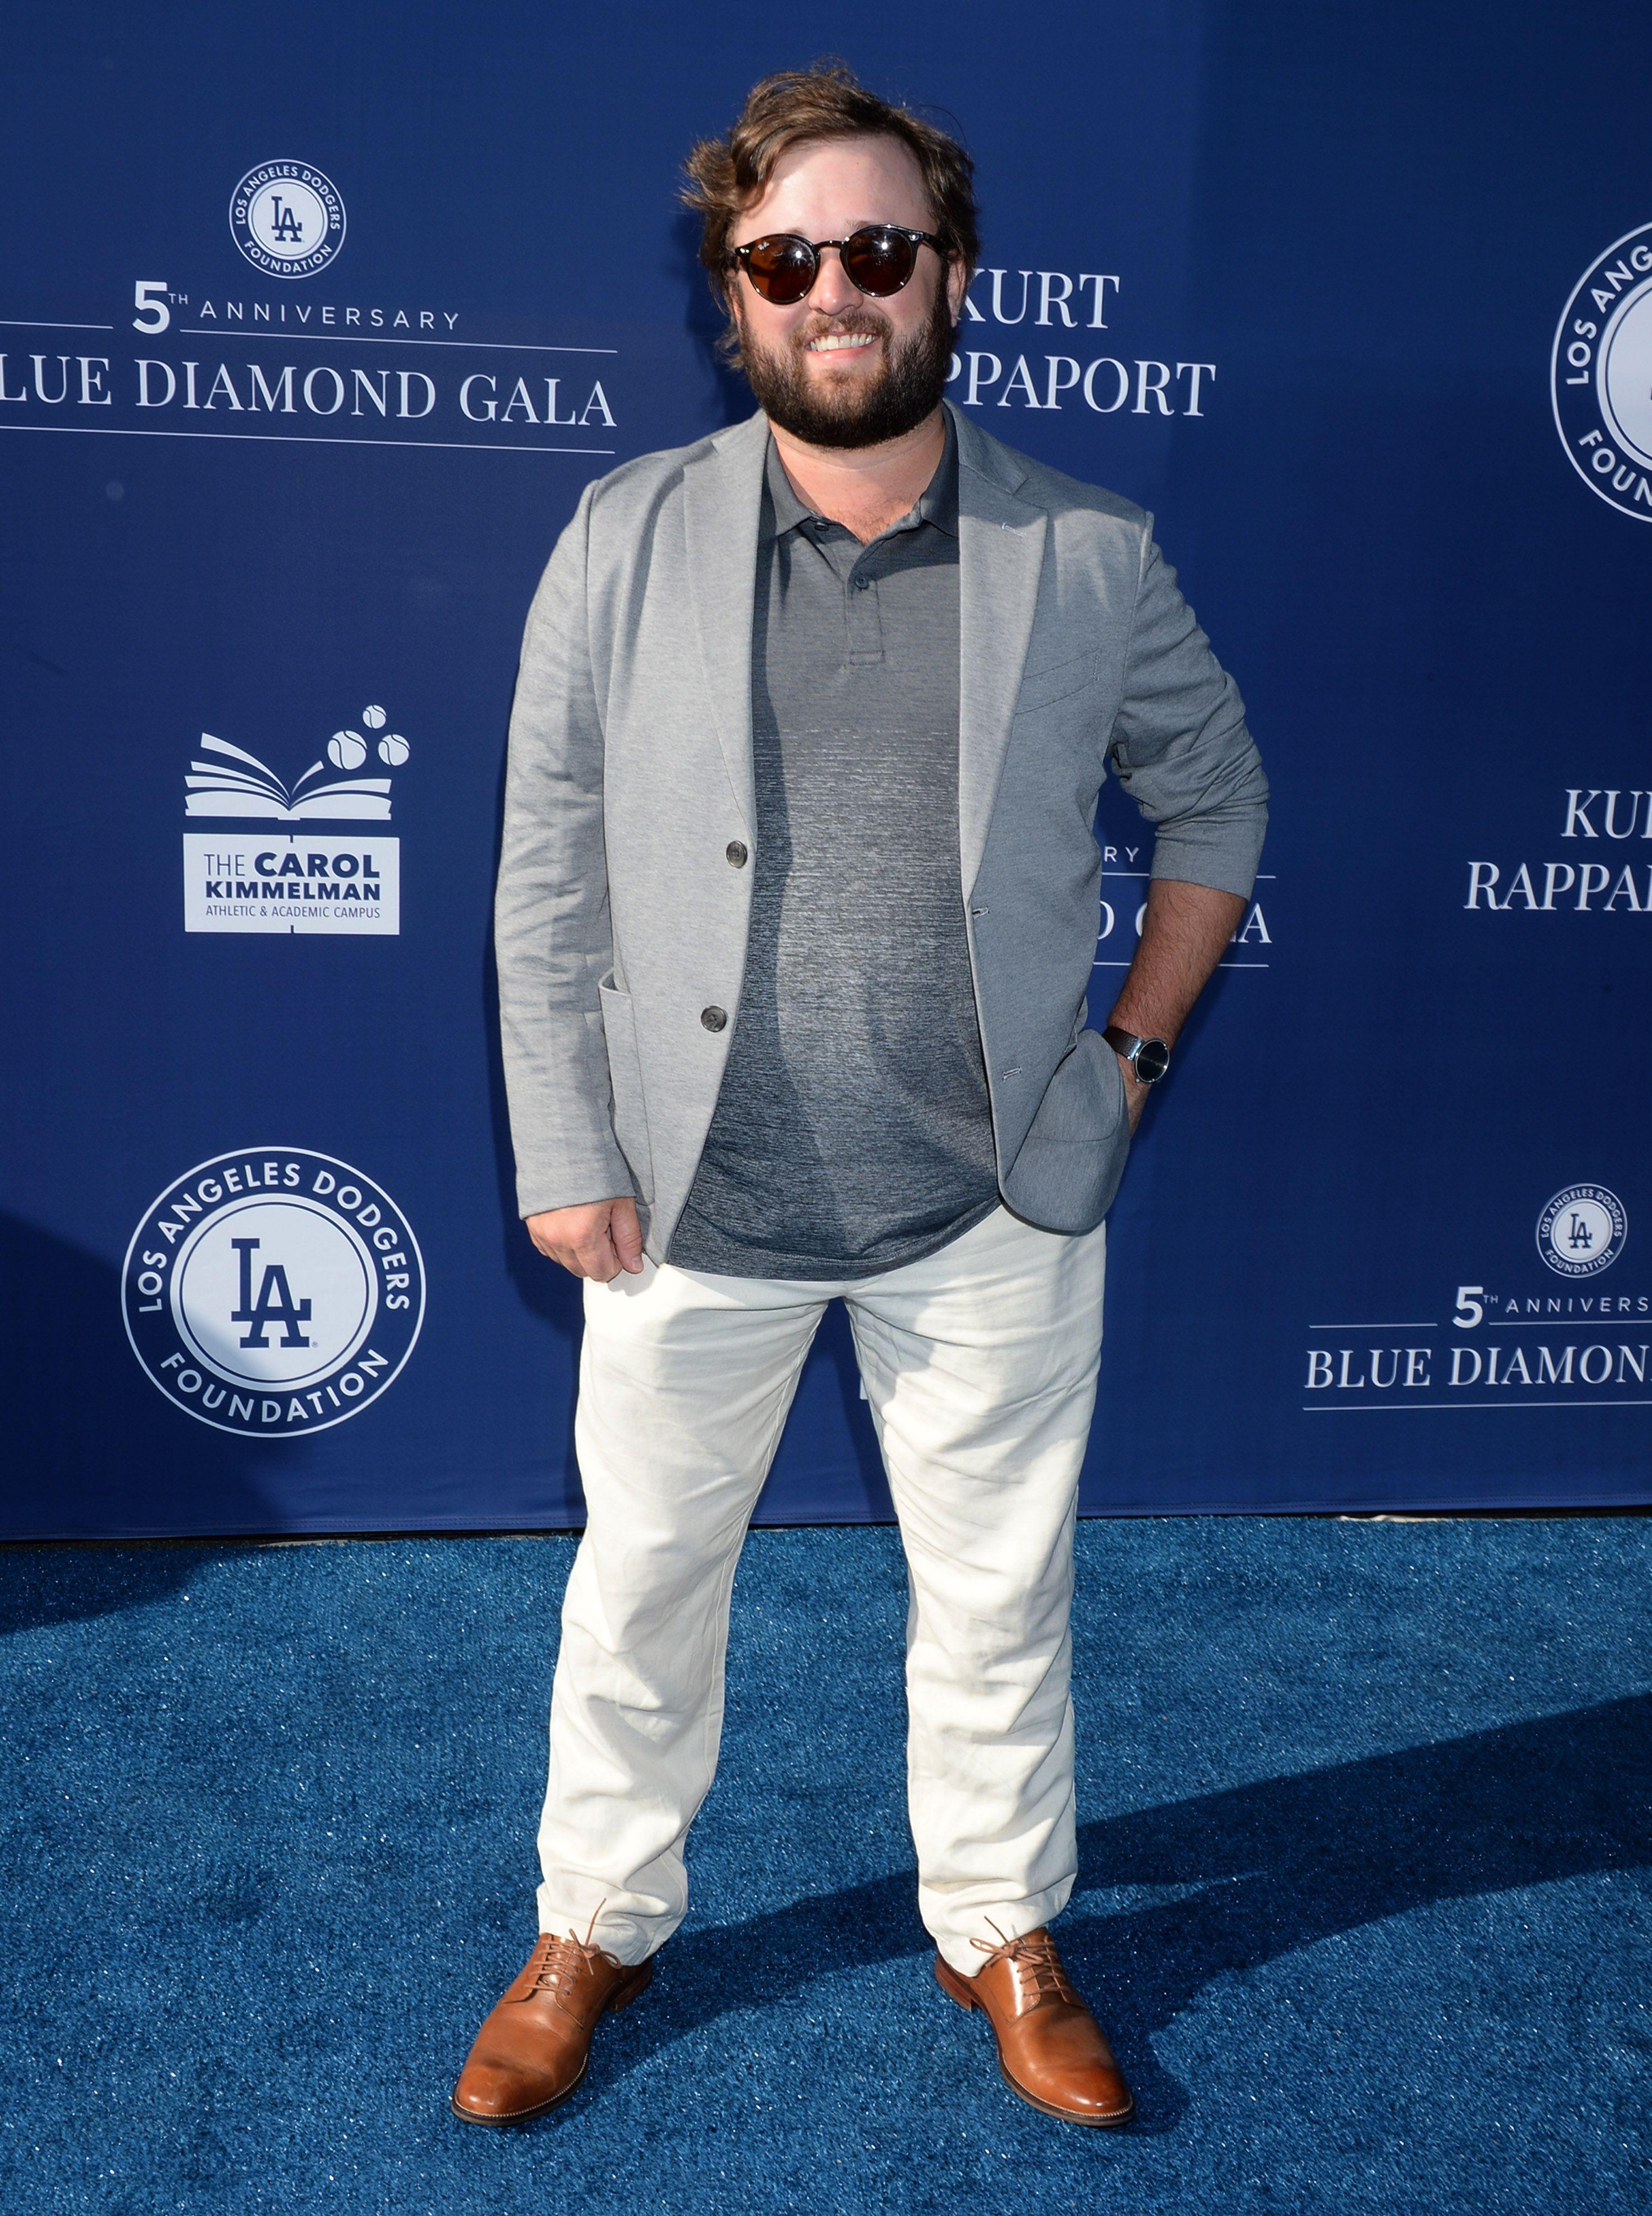 Bruno Mars Brings Down the House at LA Dodgers' Blue Diamond